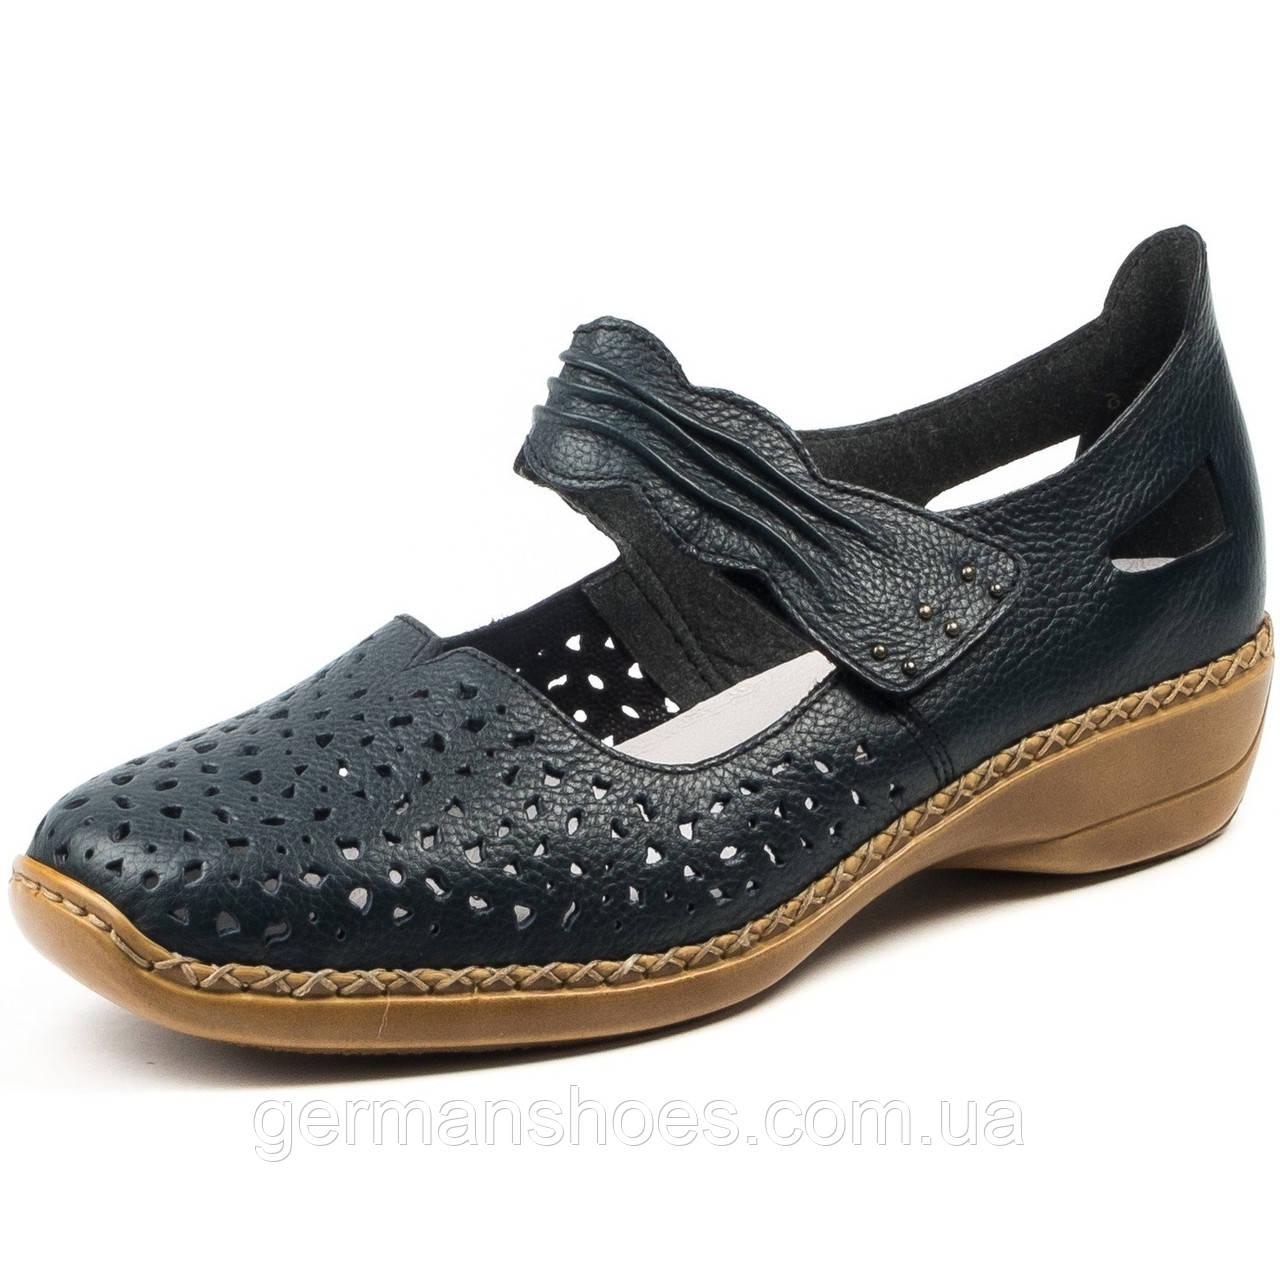 Туфли женские Rieker 41399-14